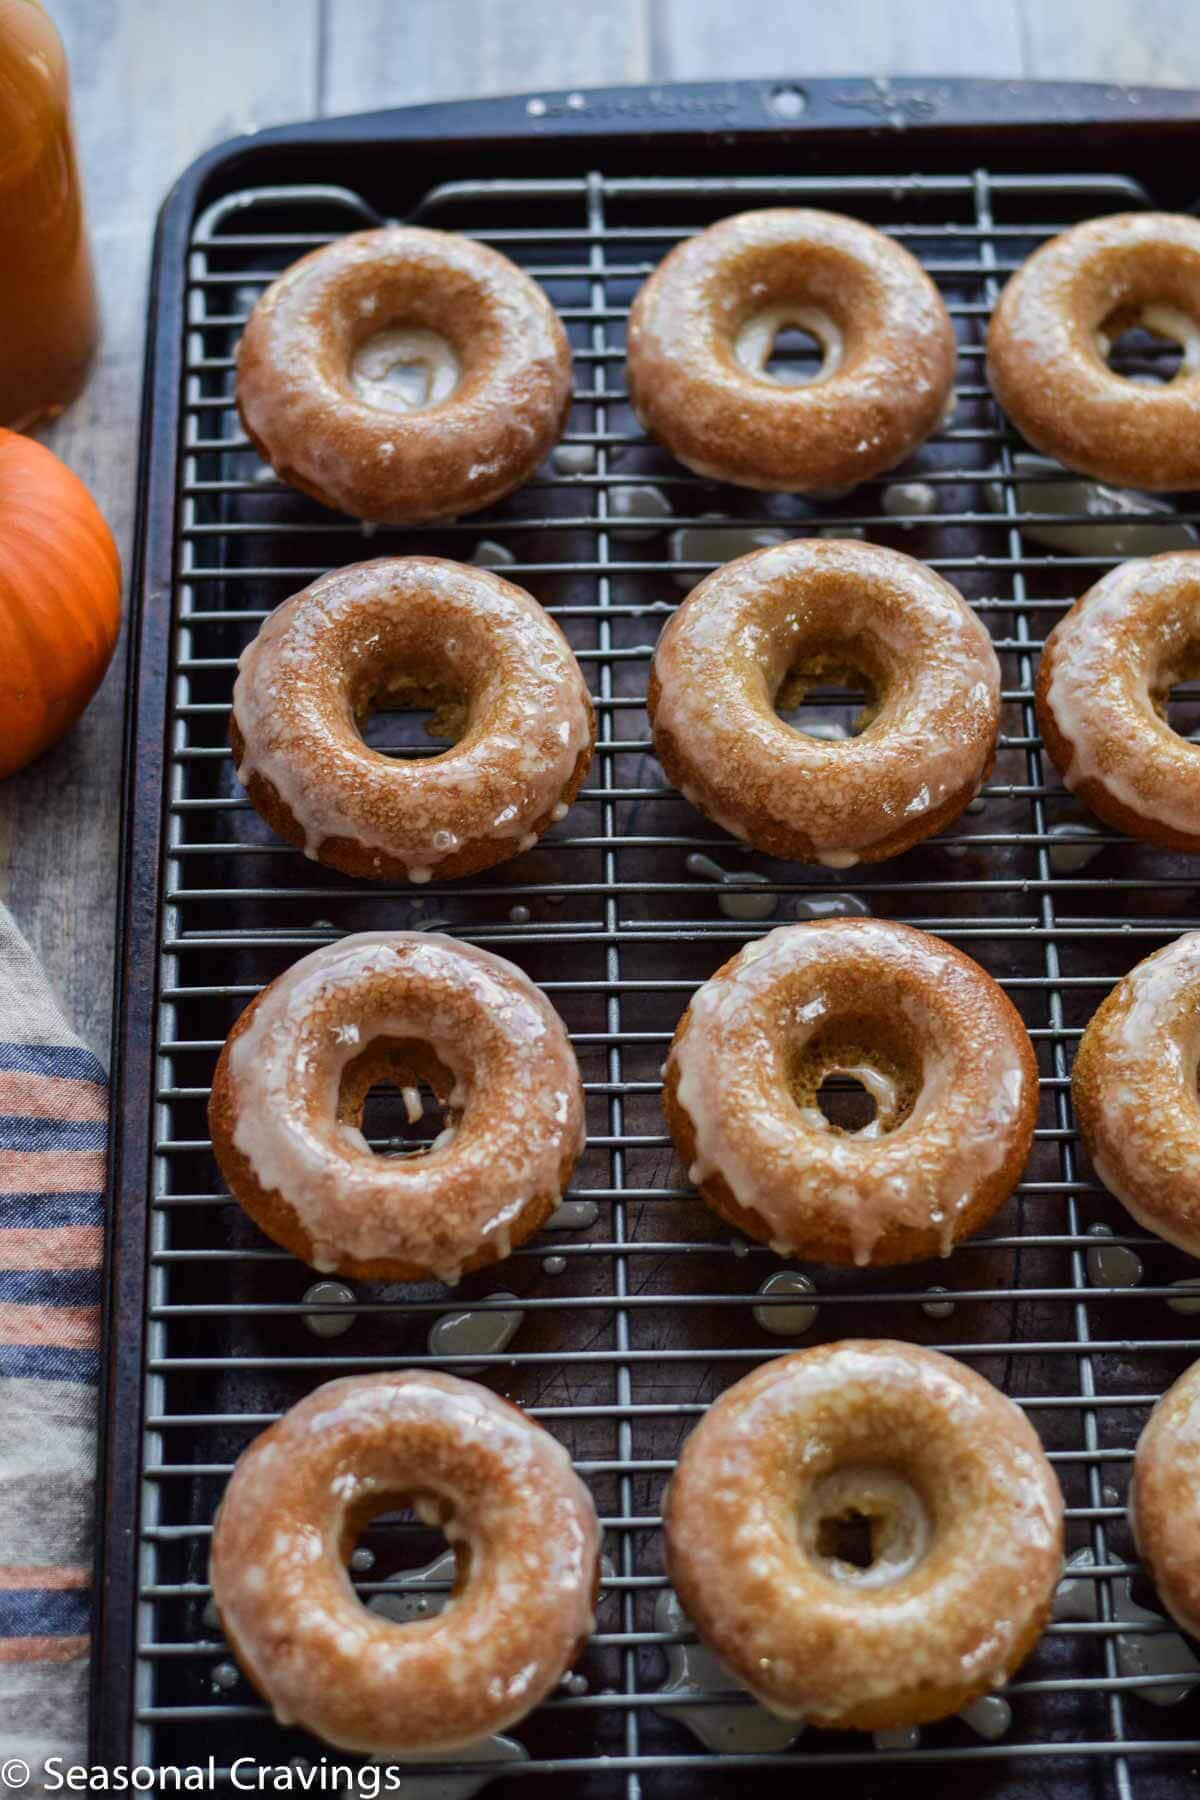 Gluten-free Apple Cider Doughnuts